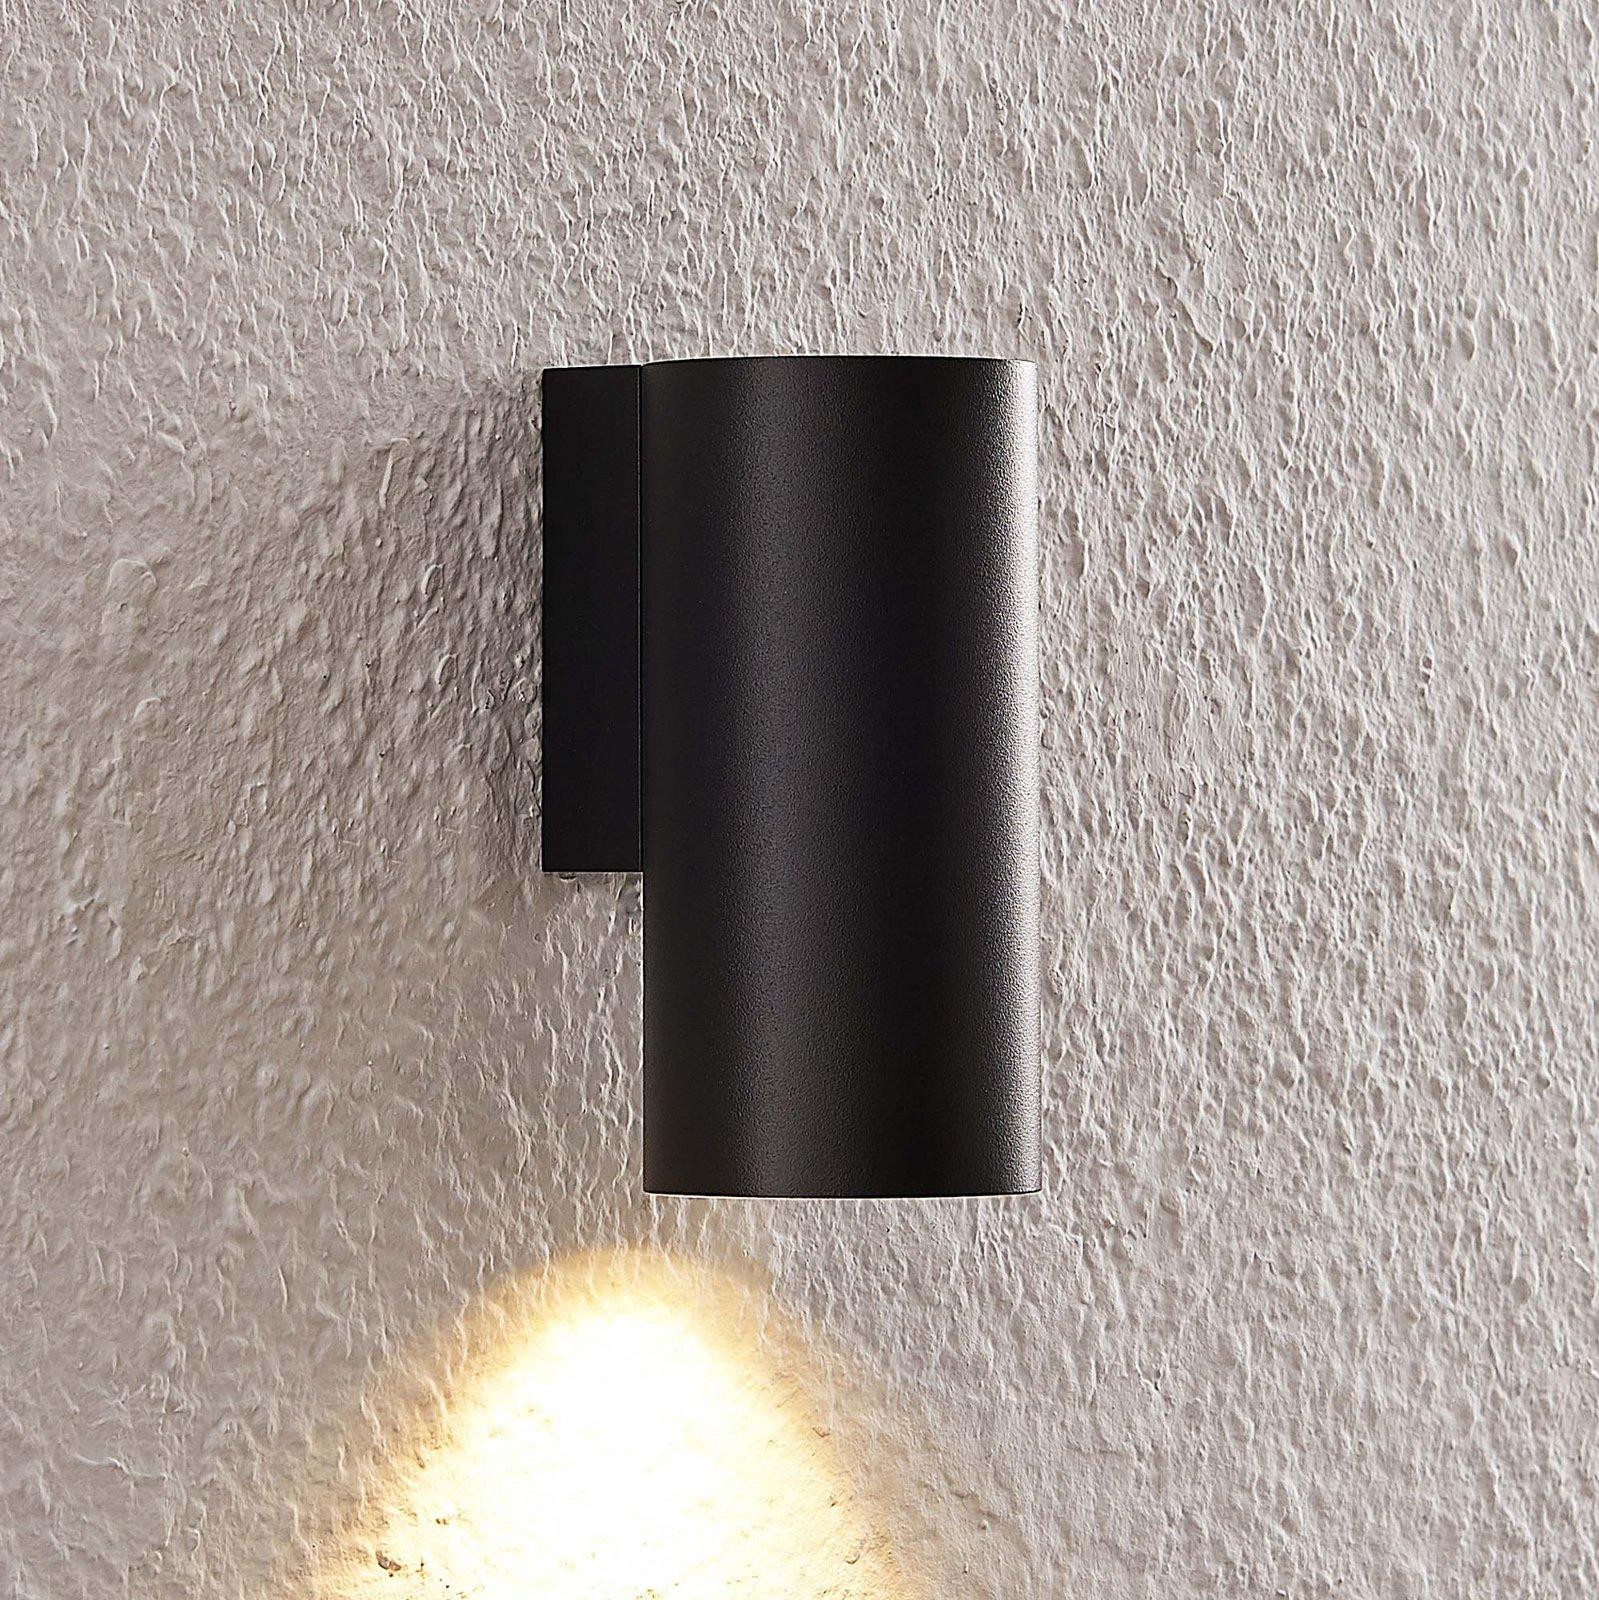 Arcchio Dilana vegglampe, rund, 1 lyskilde, svart